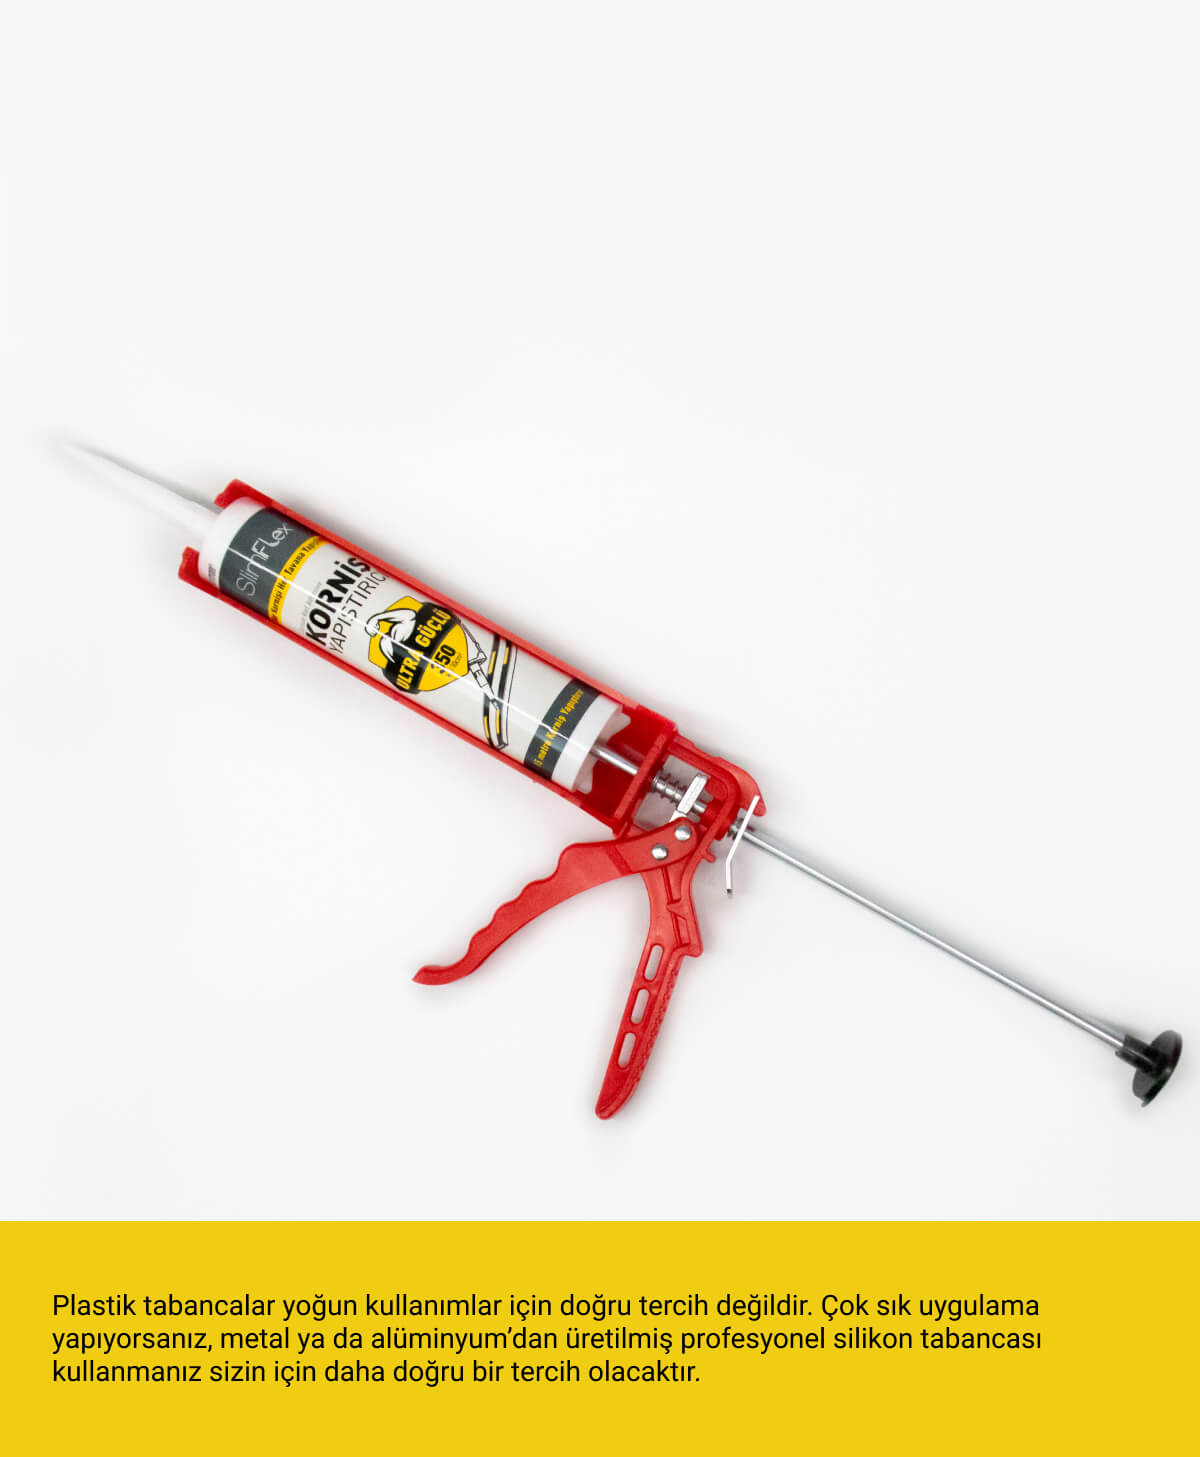 Slimflex silikon tabancası 1